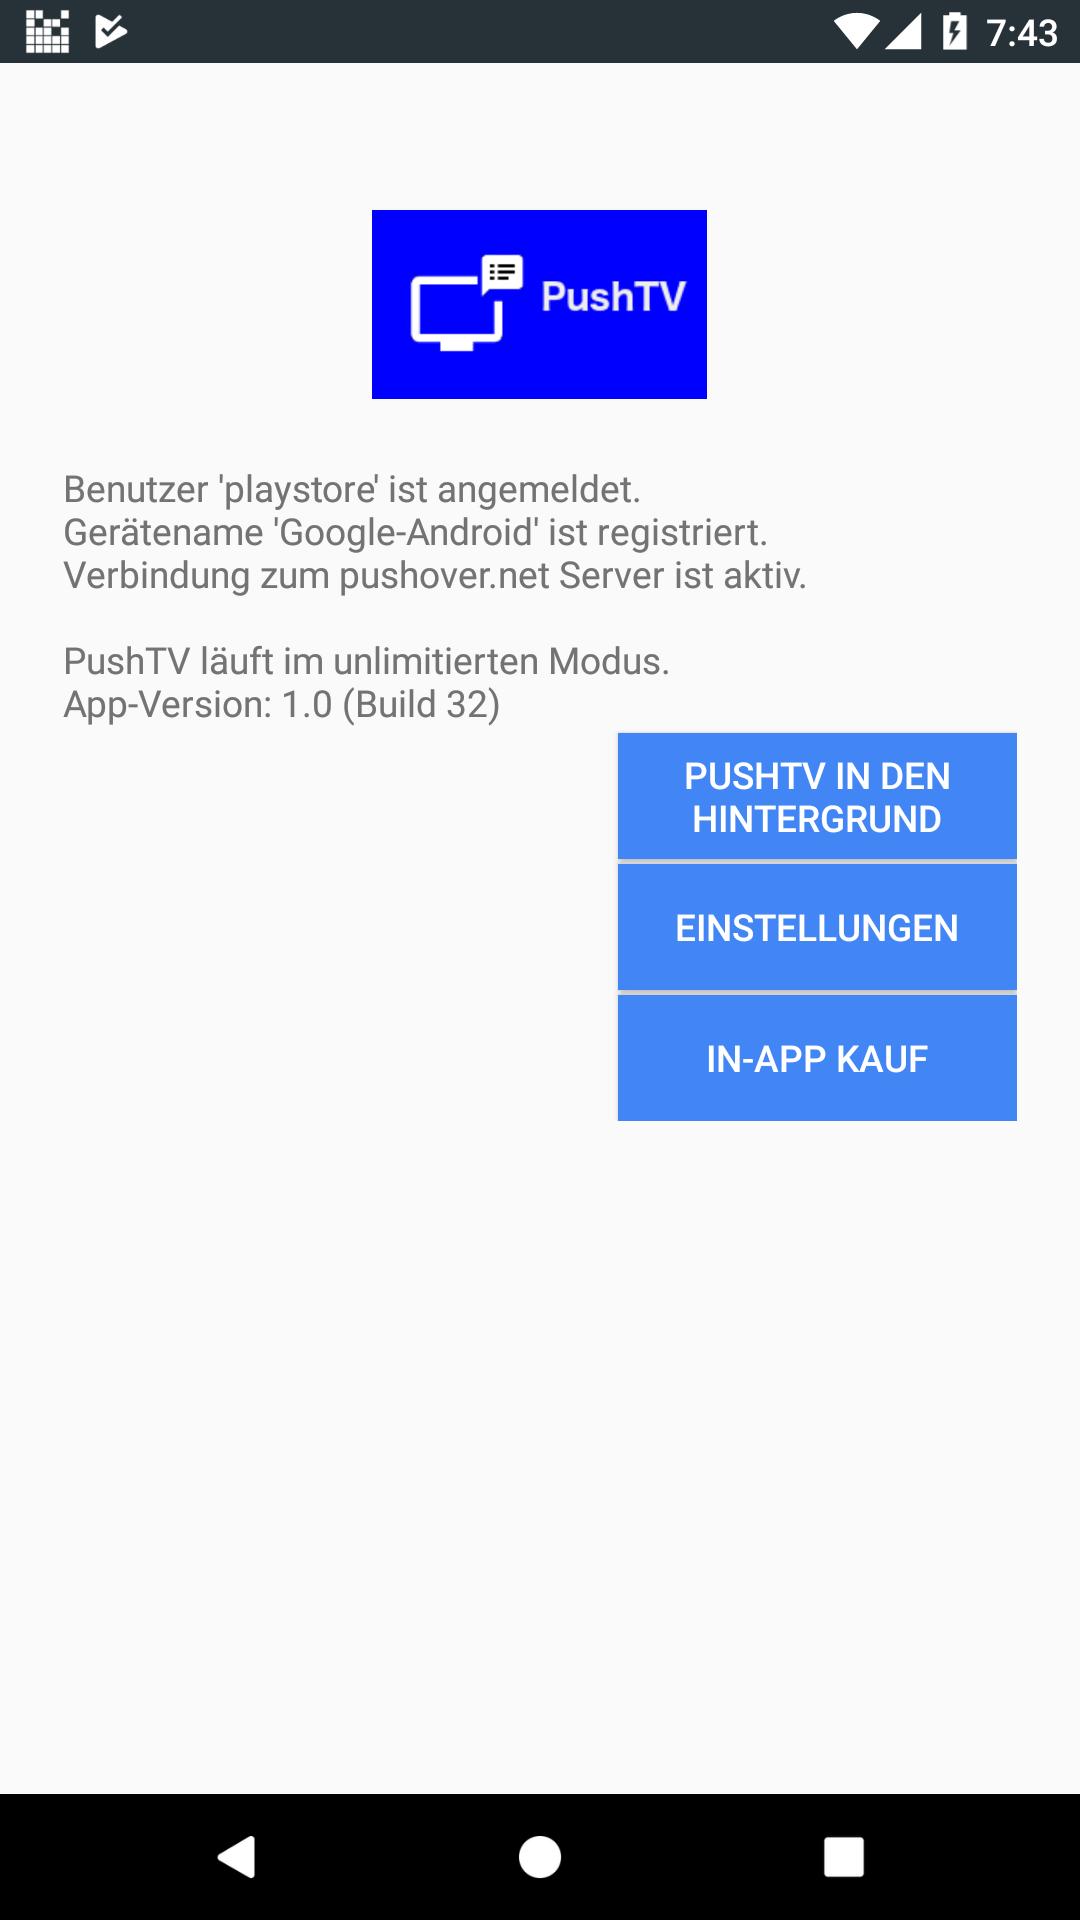 PushTV - Push-Meldungen auf dem Fire TV Screenshot